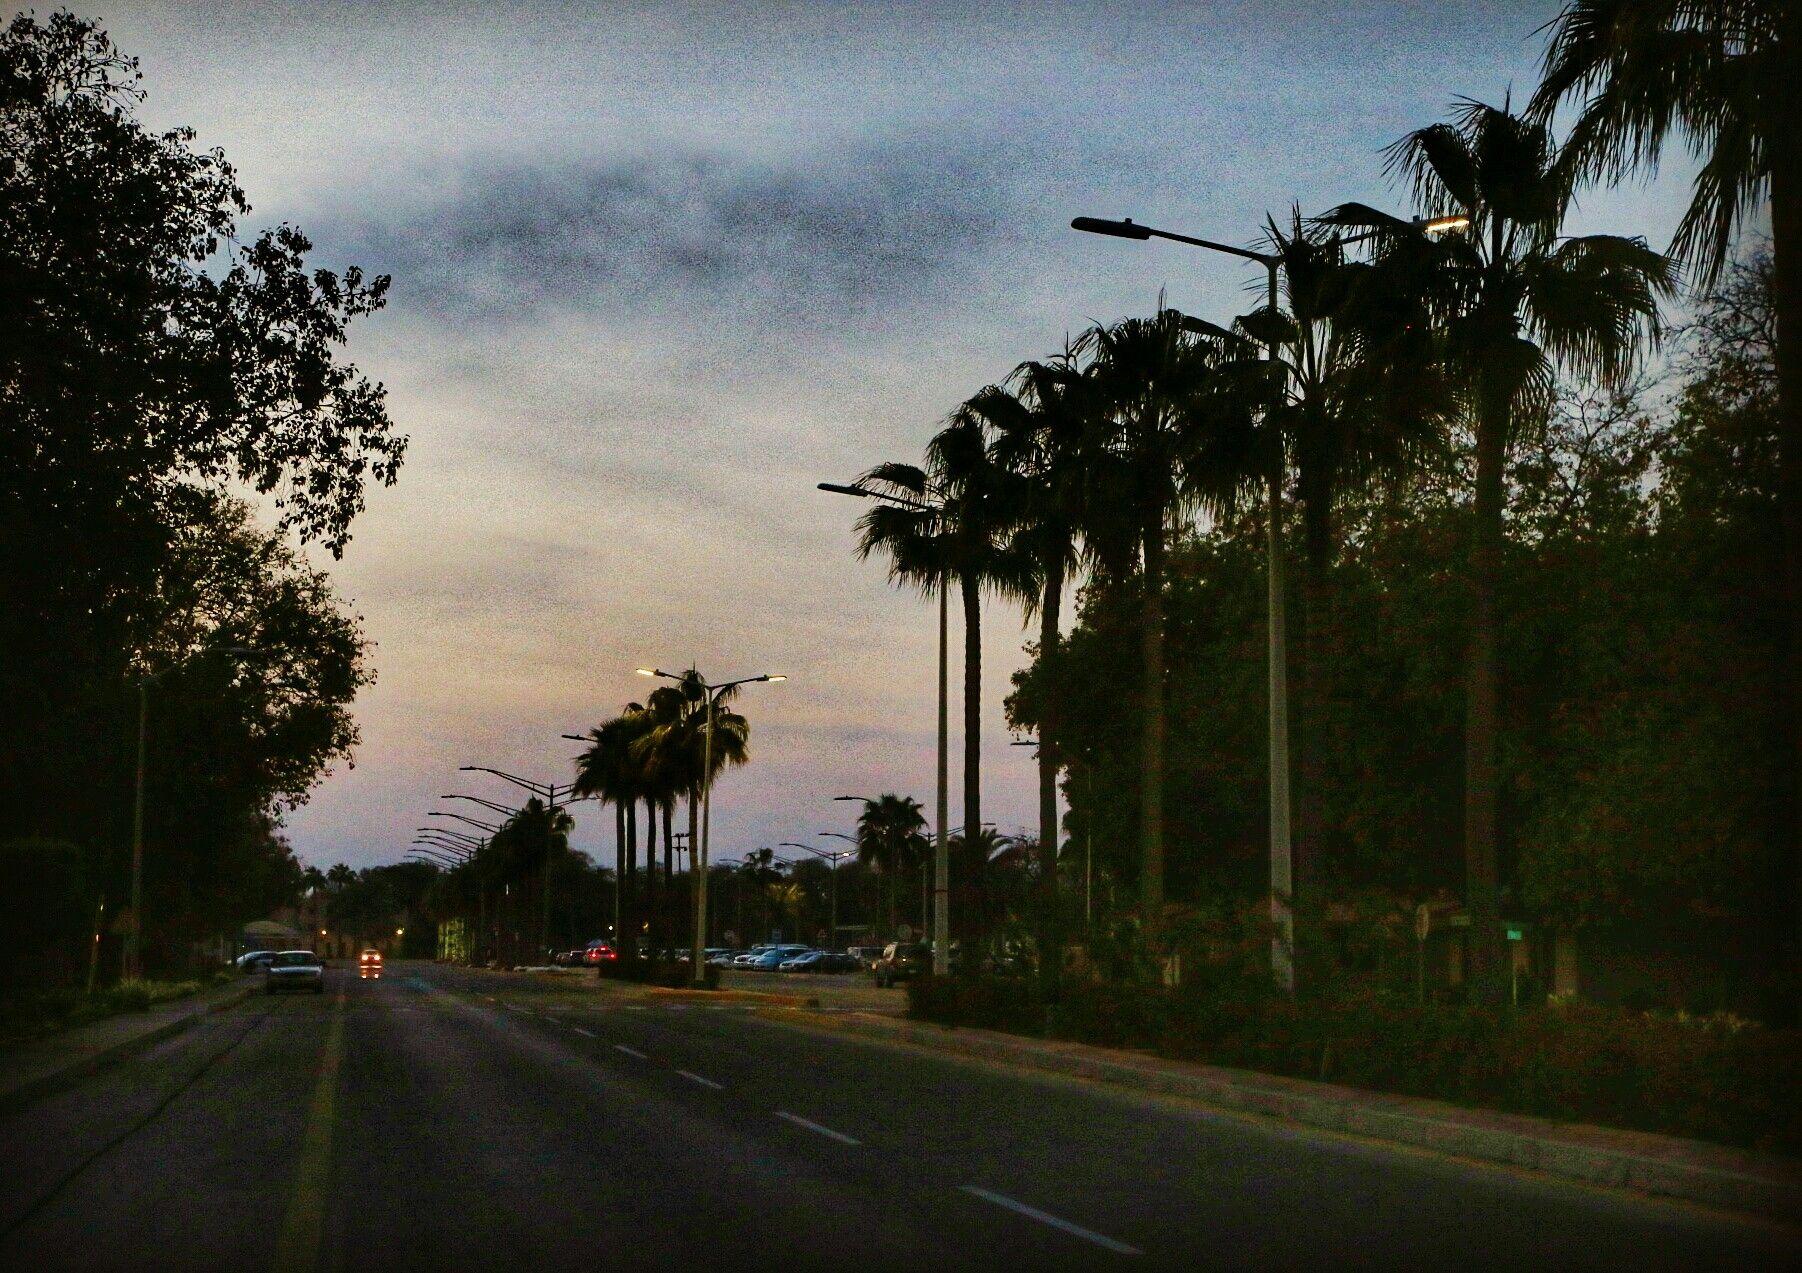 لحظة غروب راس تنورة Country Roads Photo City